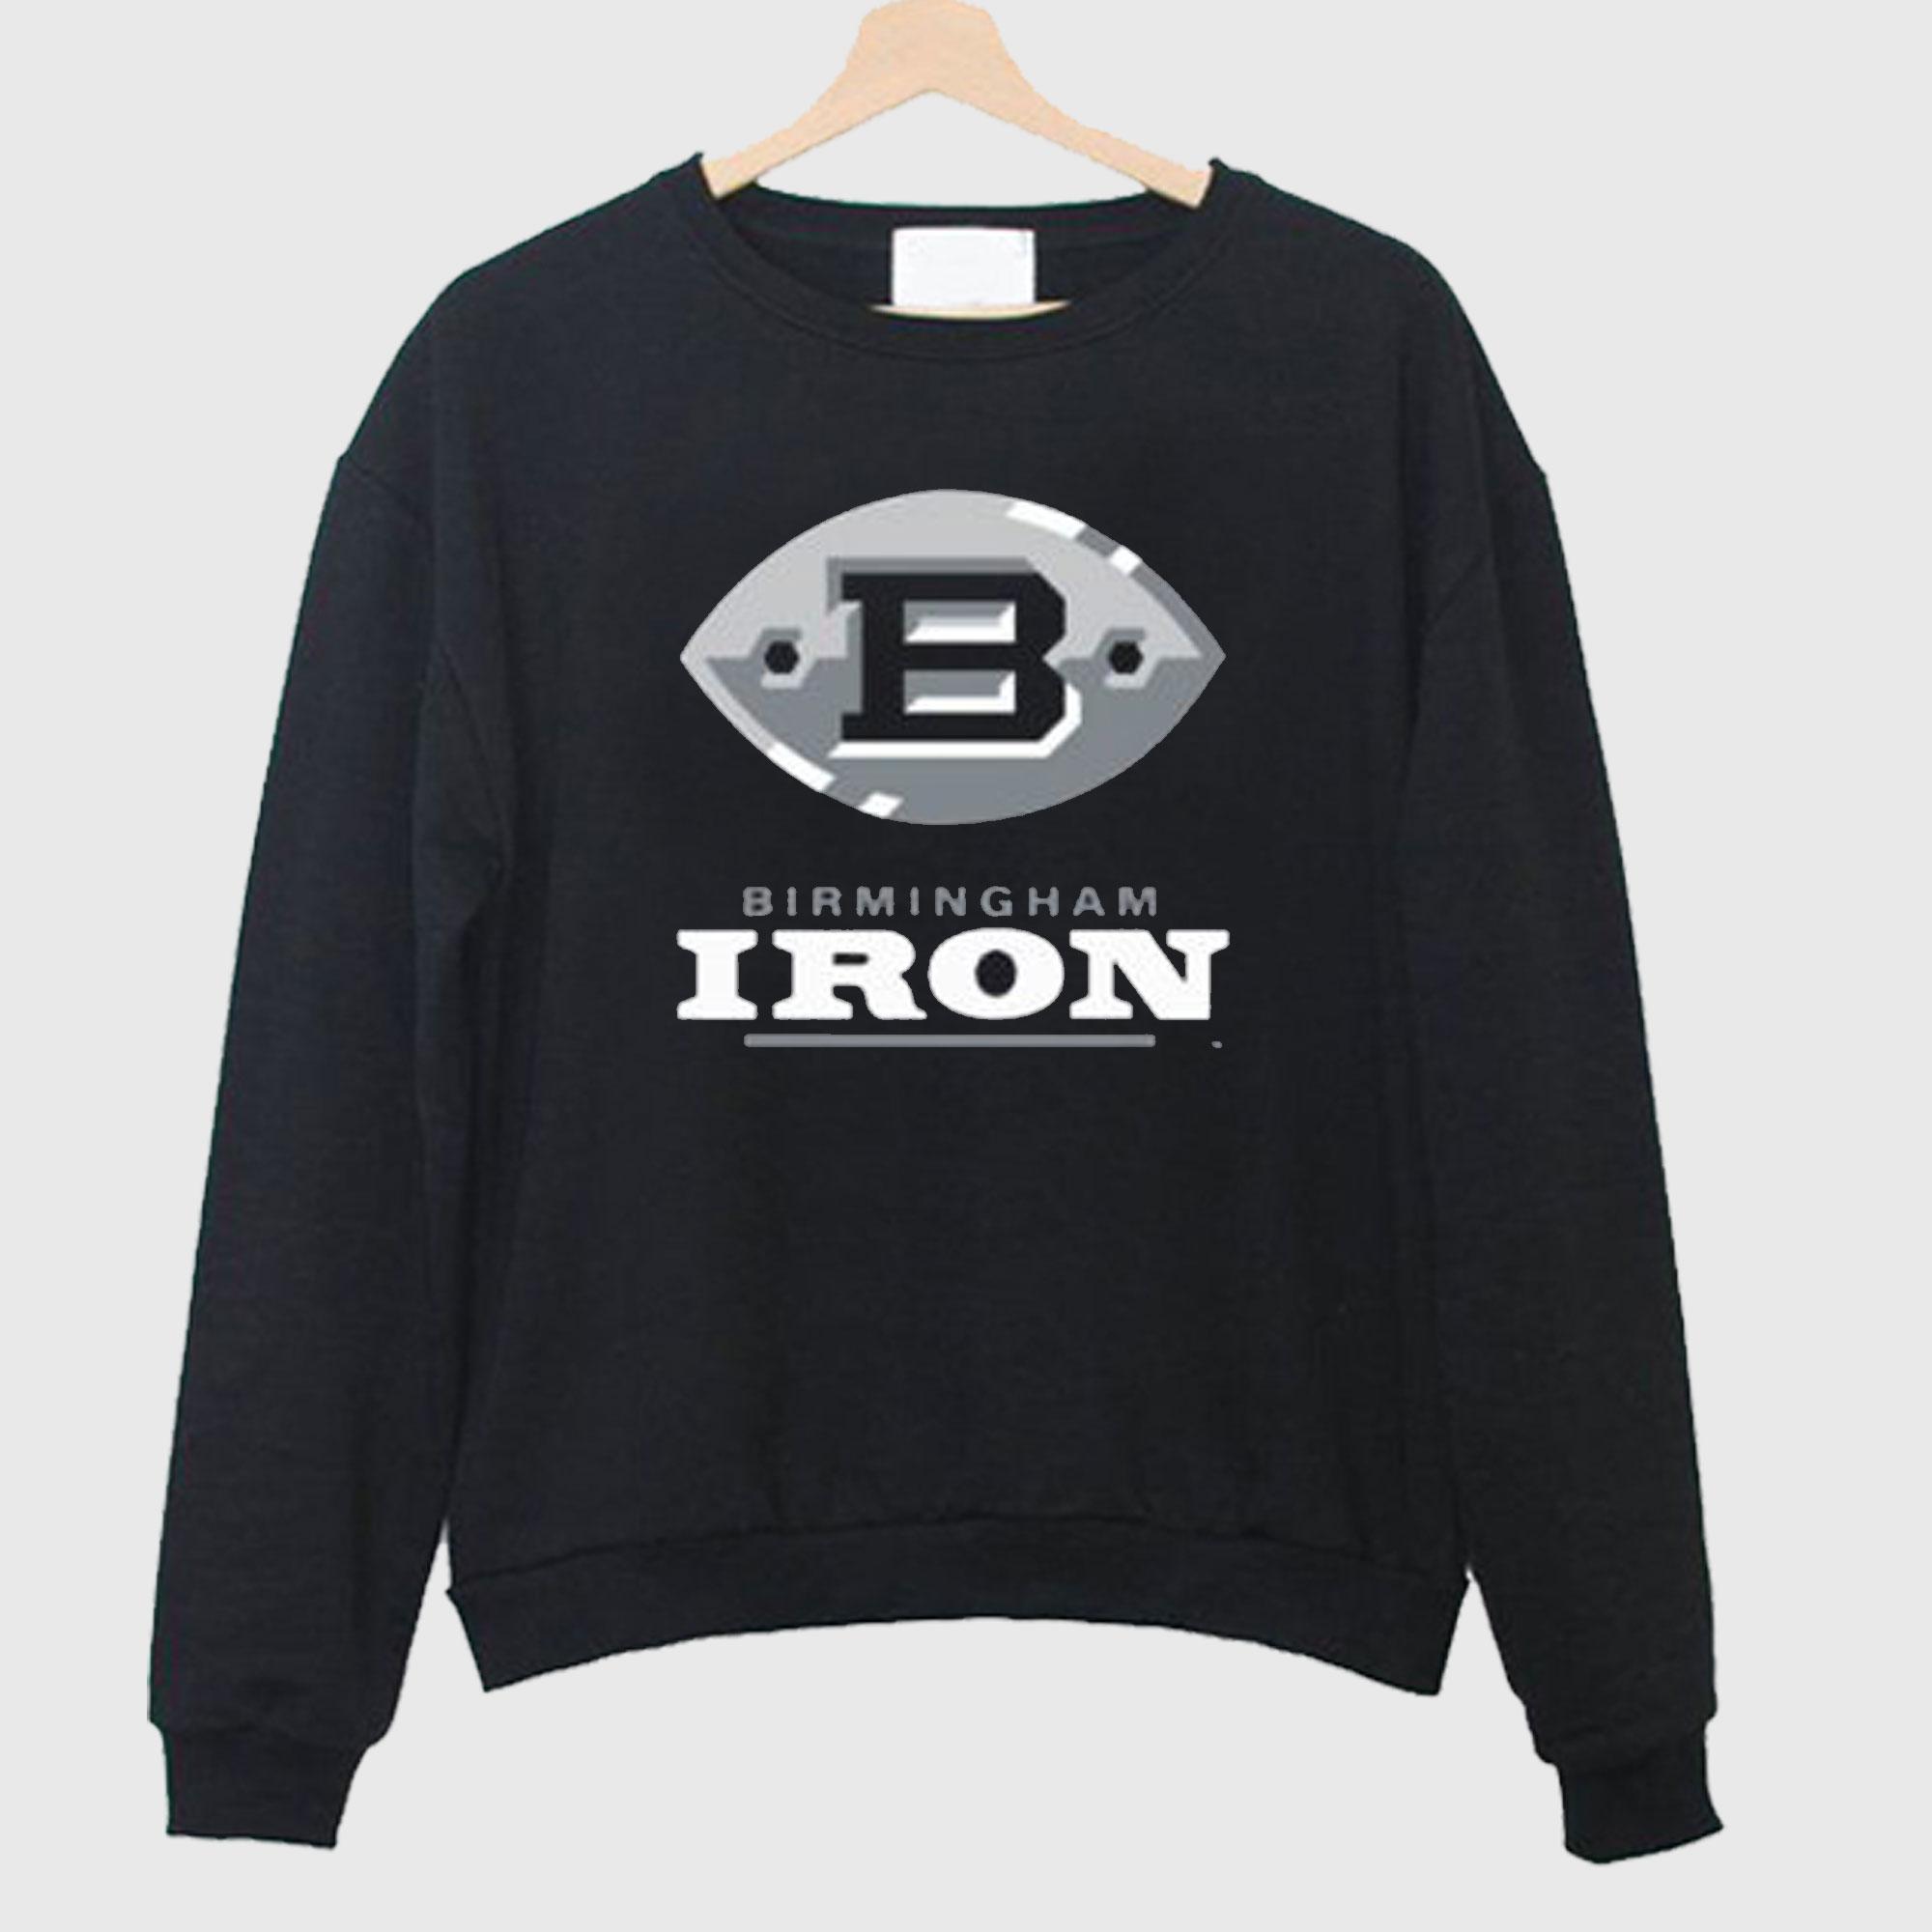 Birmingham Iron Sweatshirt